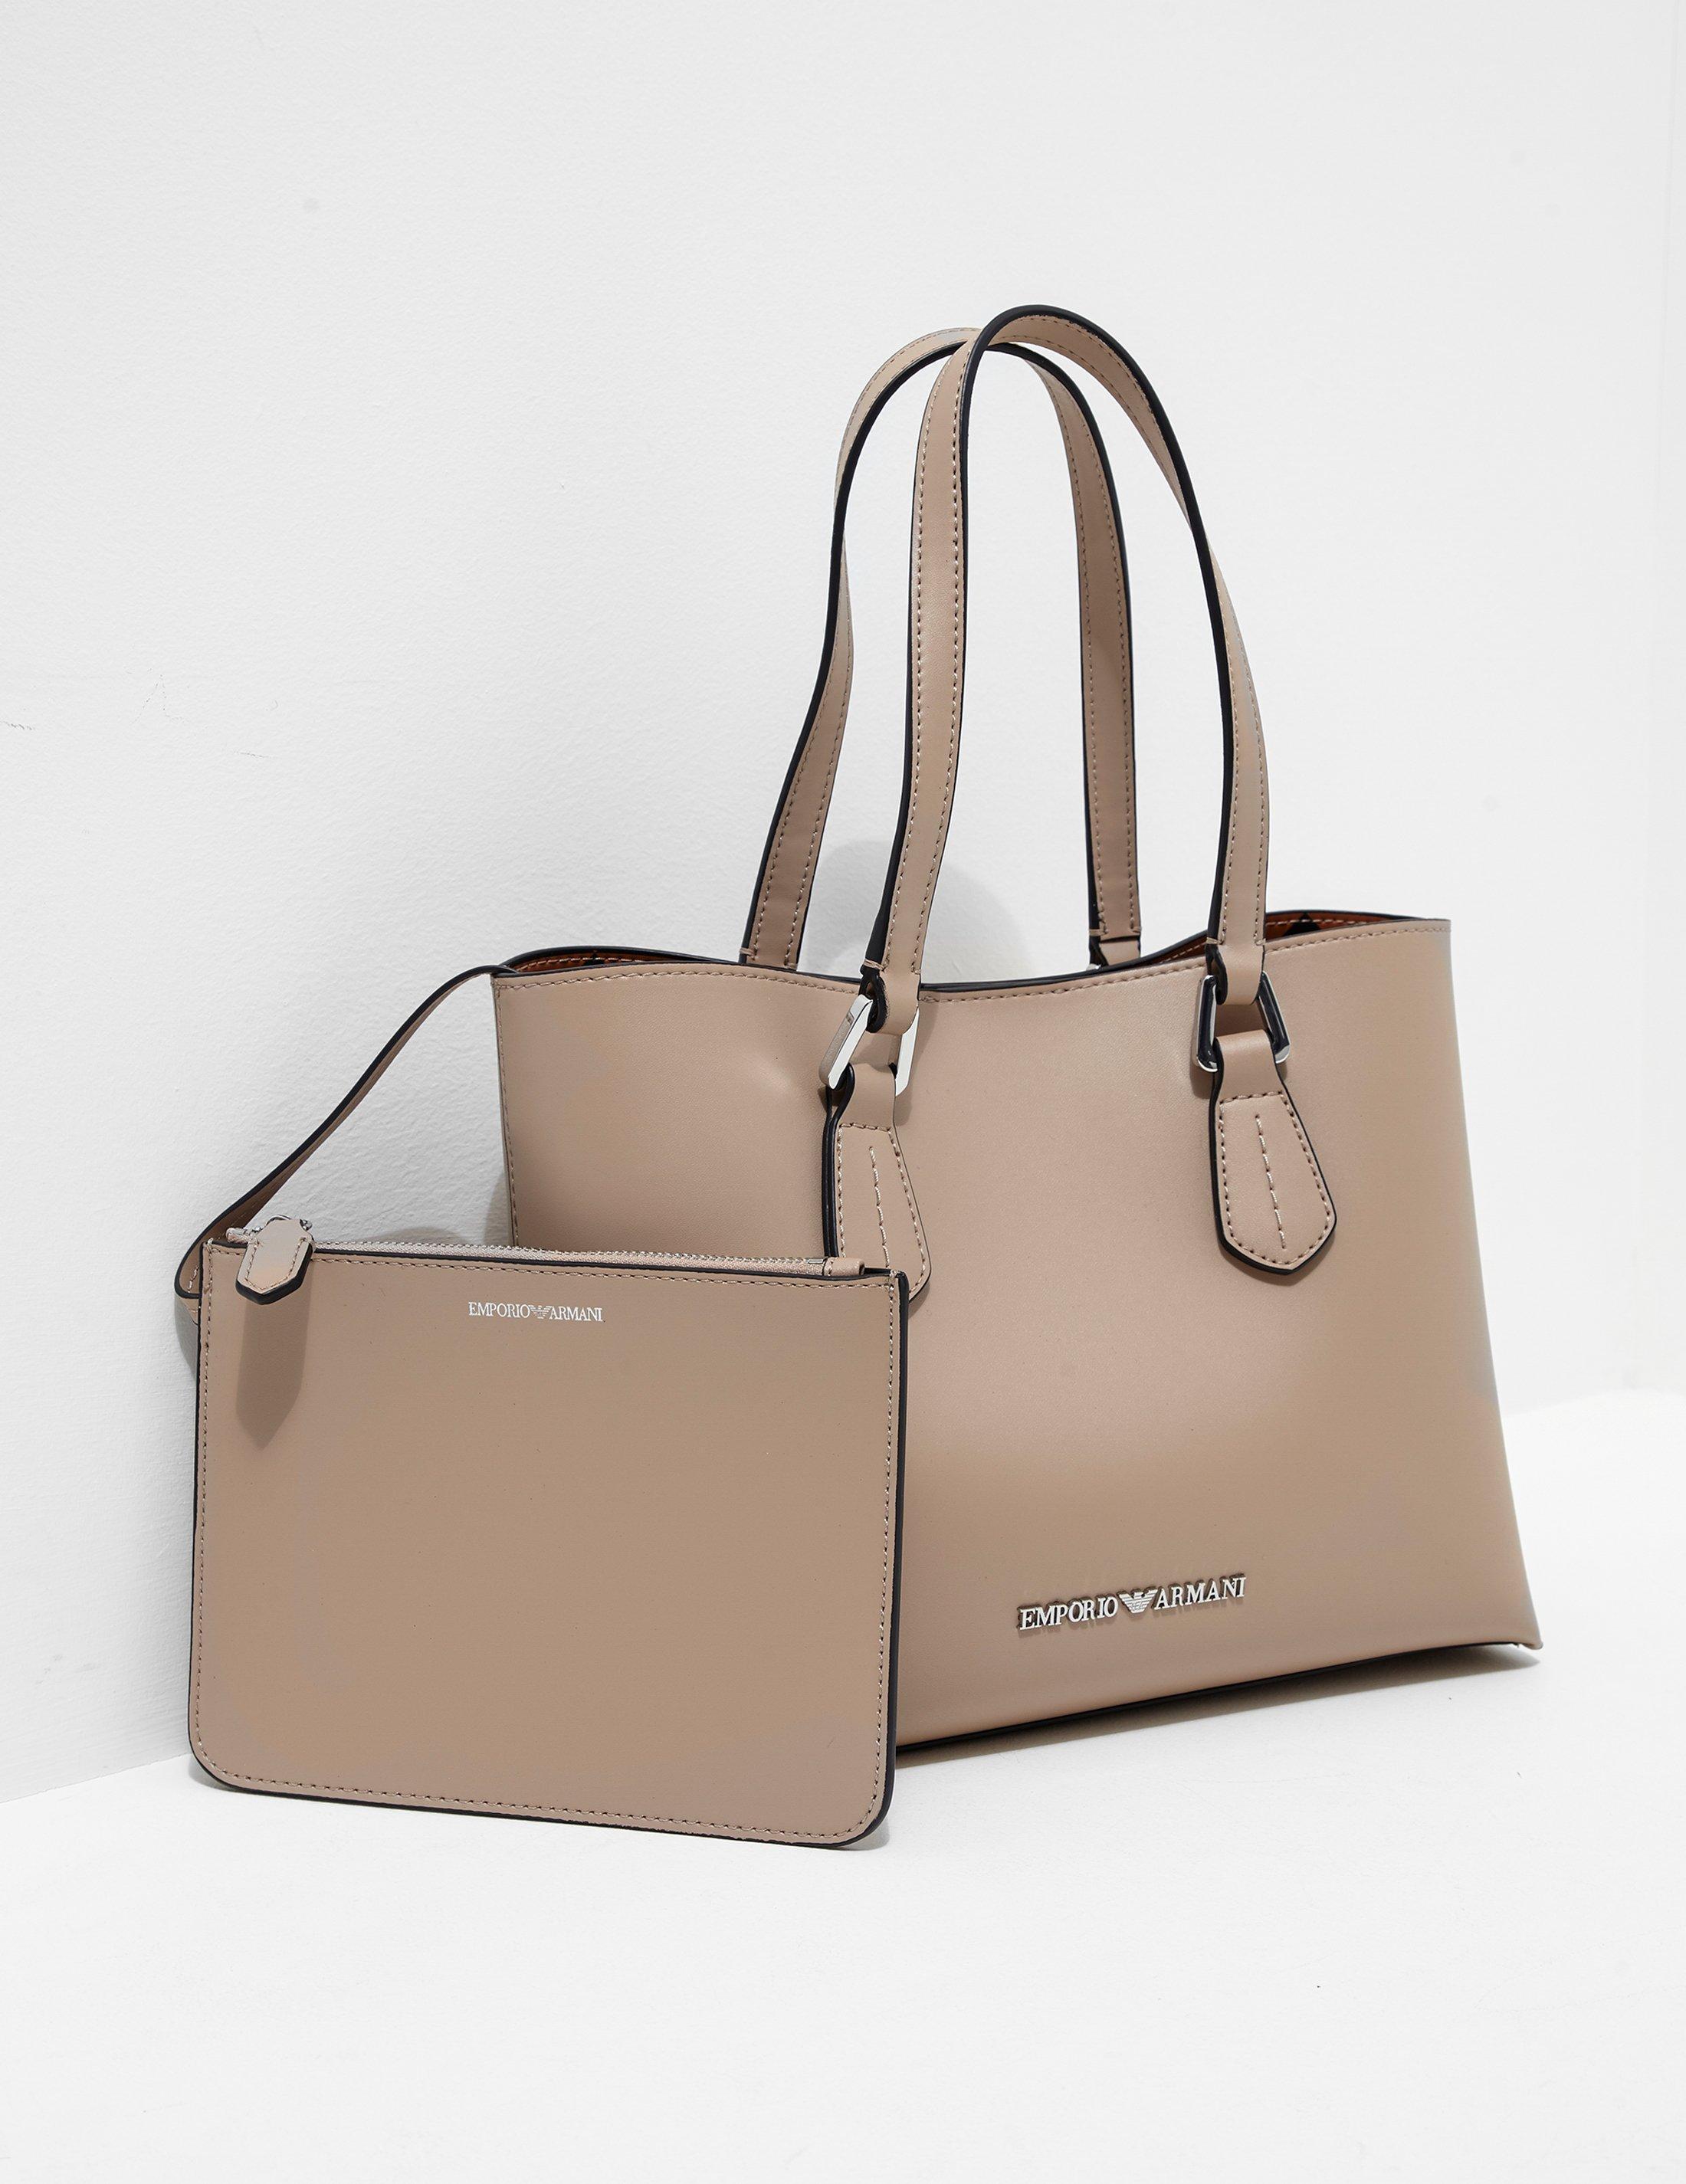 Lyst - Emporio Armani Womens Wilma Medium Shopper Bag Beige in Natural bd0d9a7c183fe